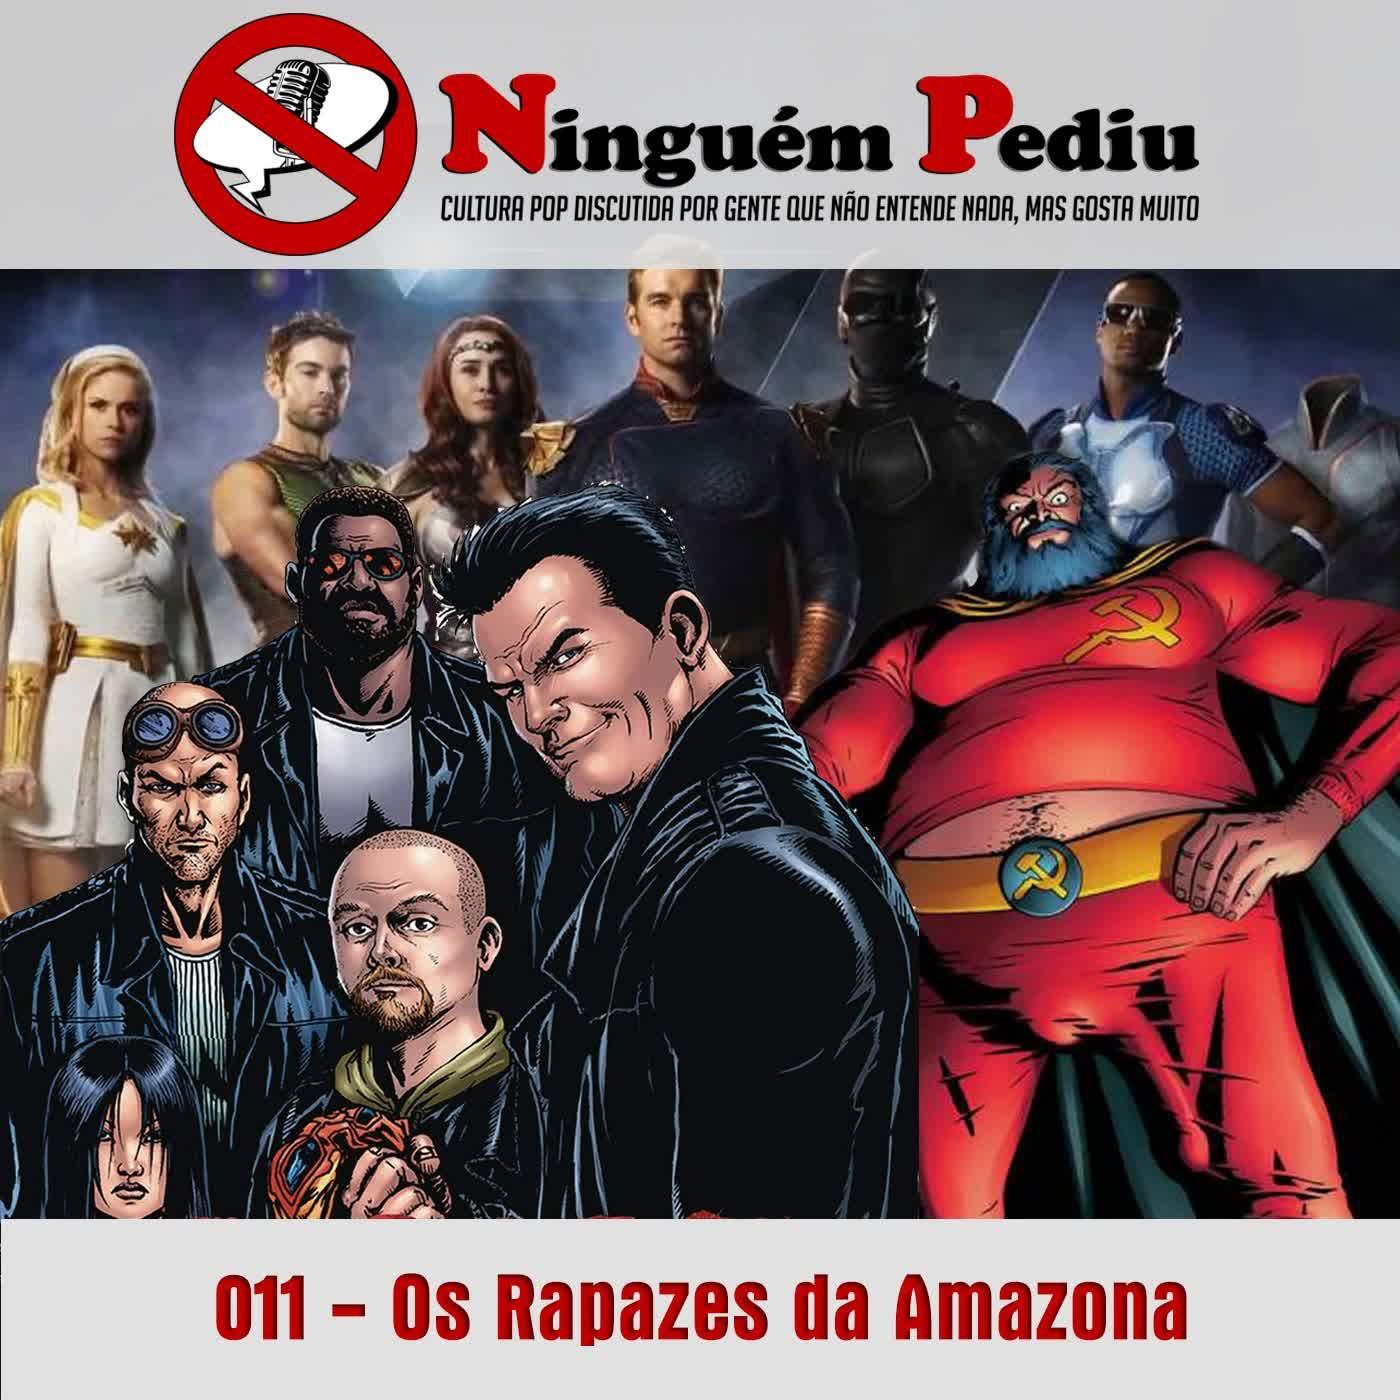 011 - Os Rapazes da Amazona